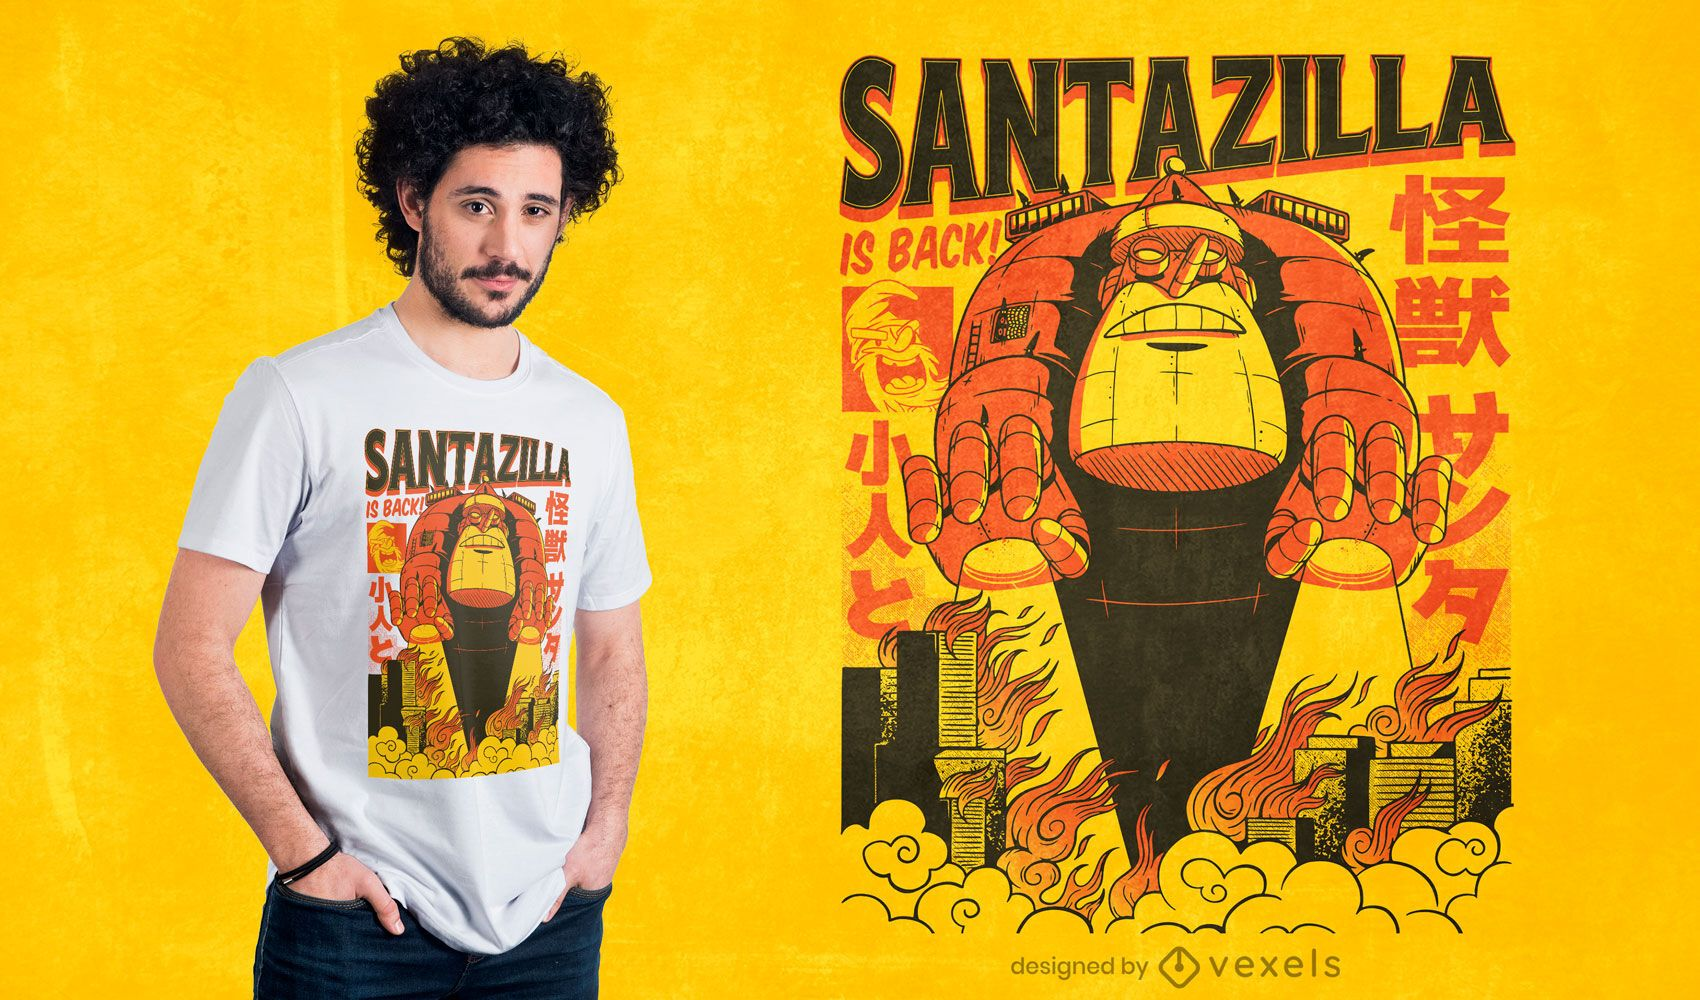 santazilla is back t-shirt design